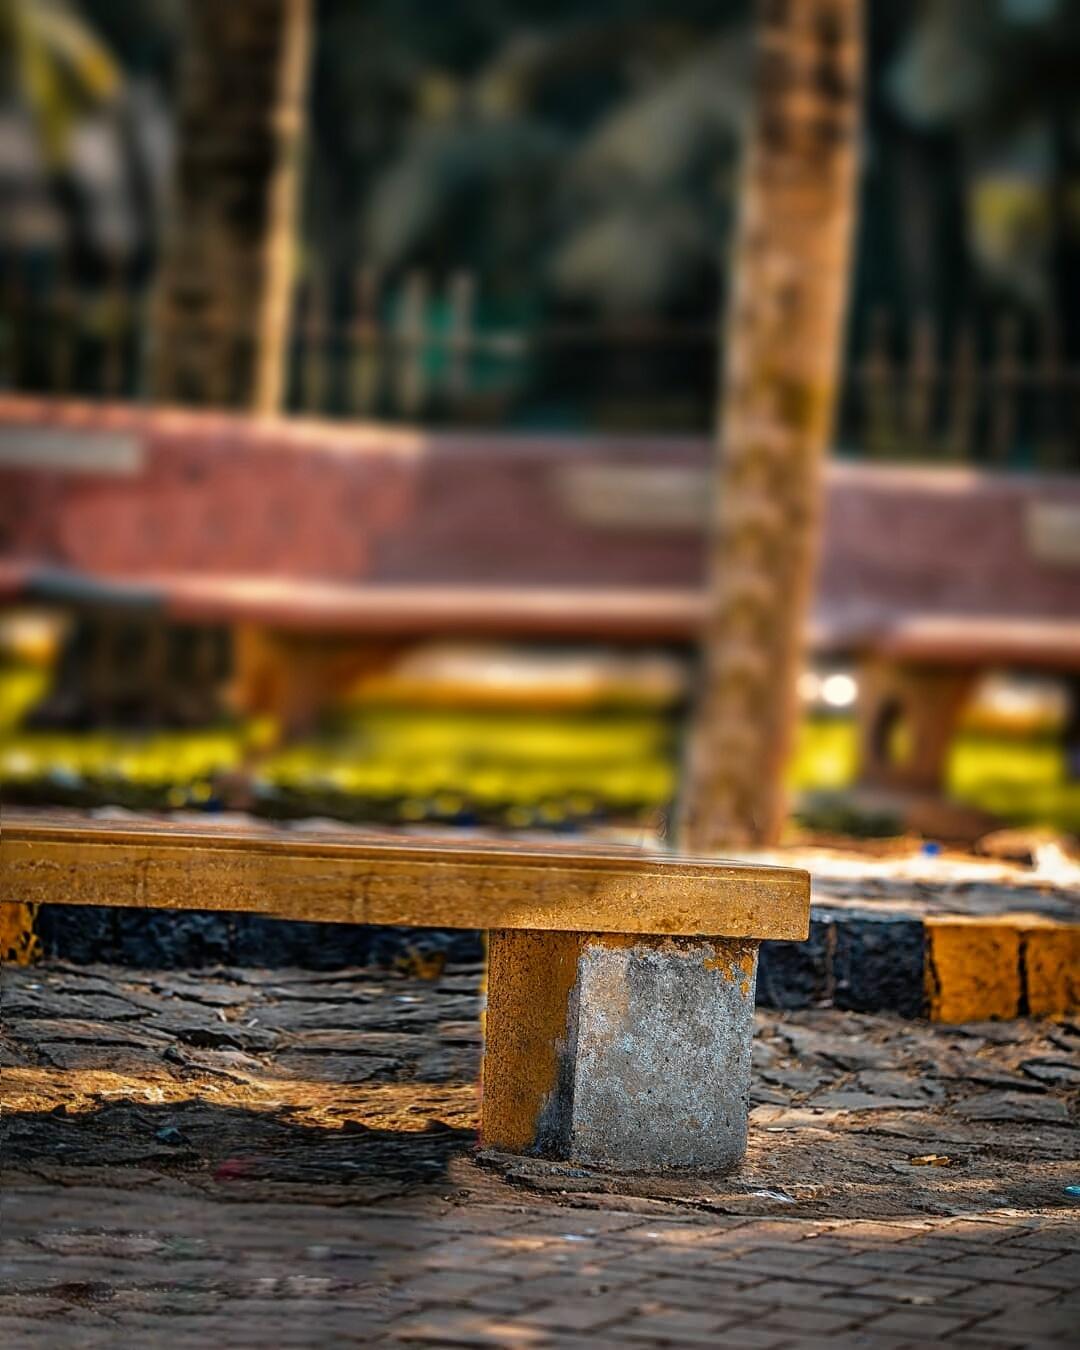 Picsart Editing Background Hd Photos Download